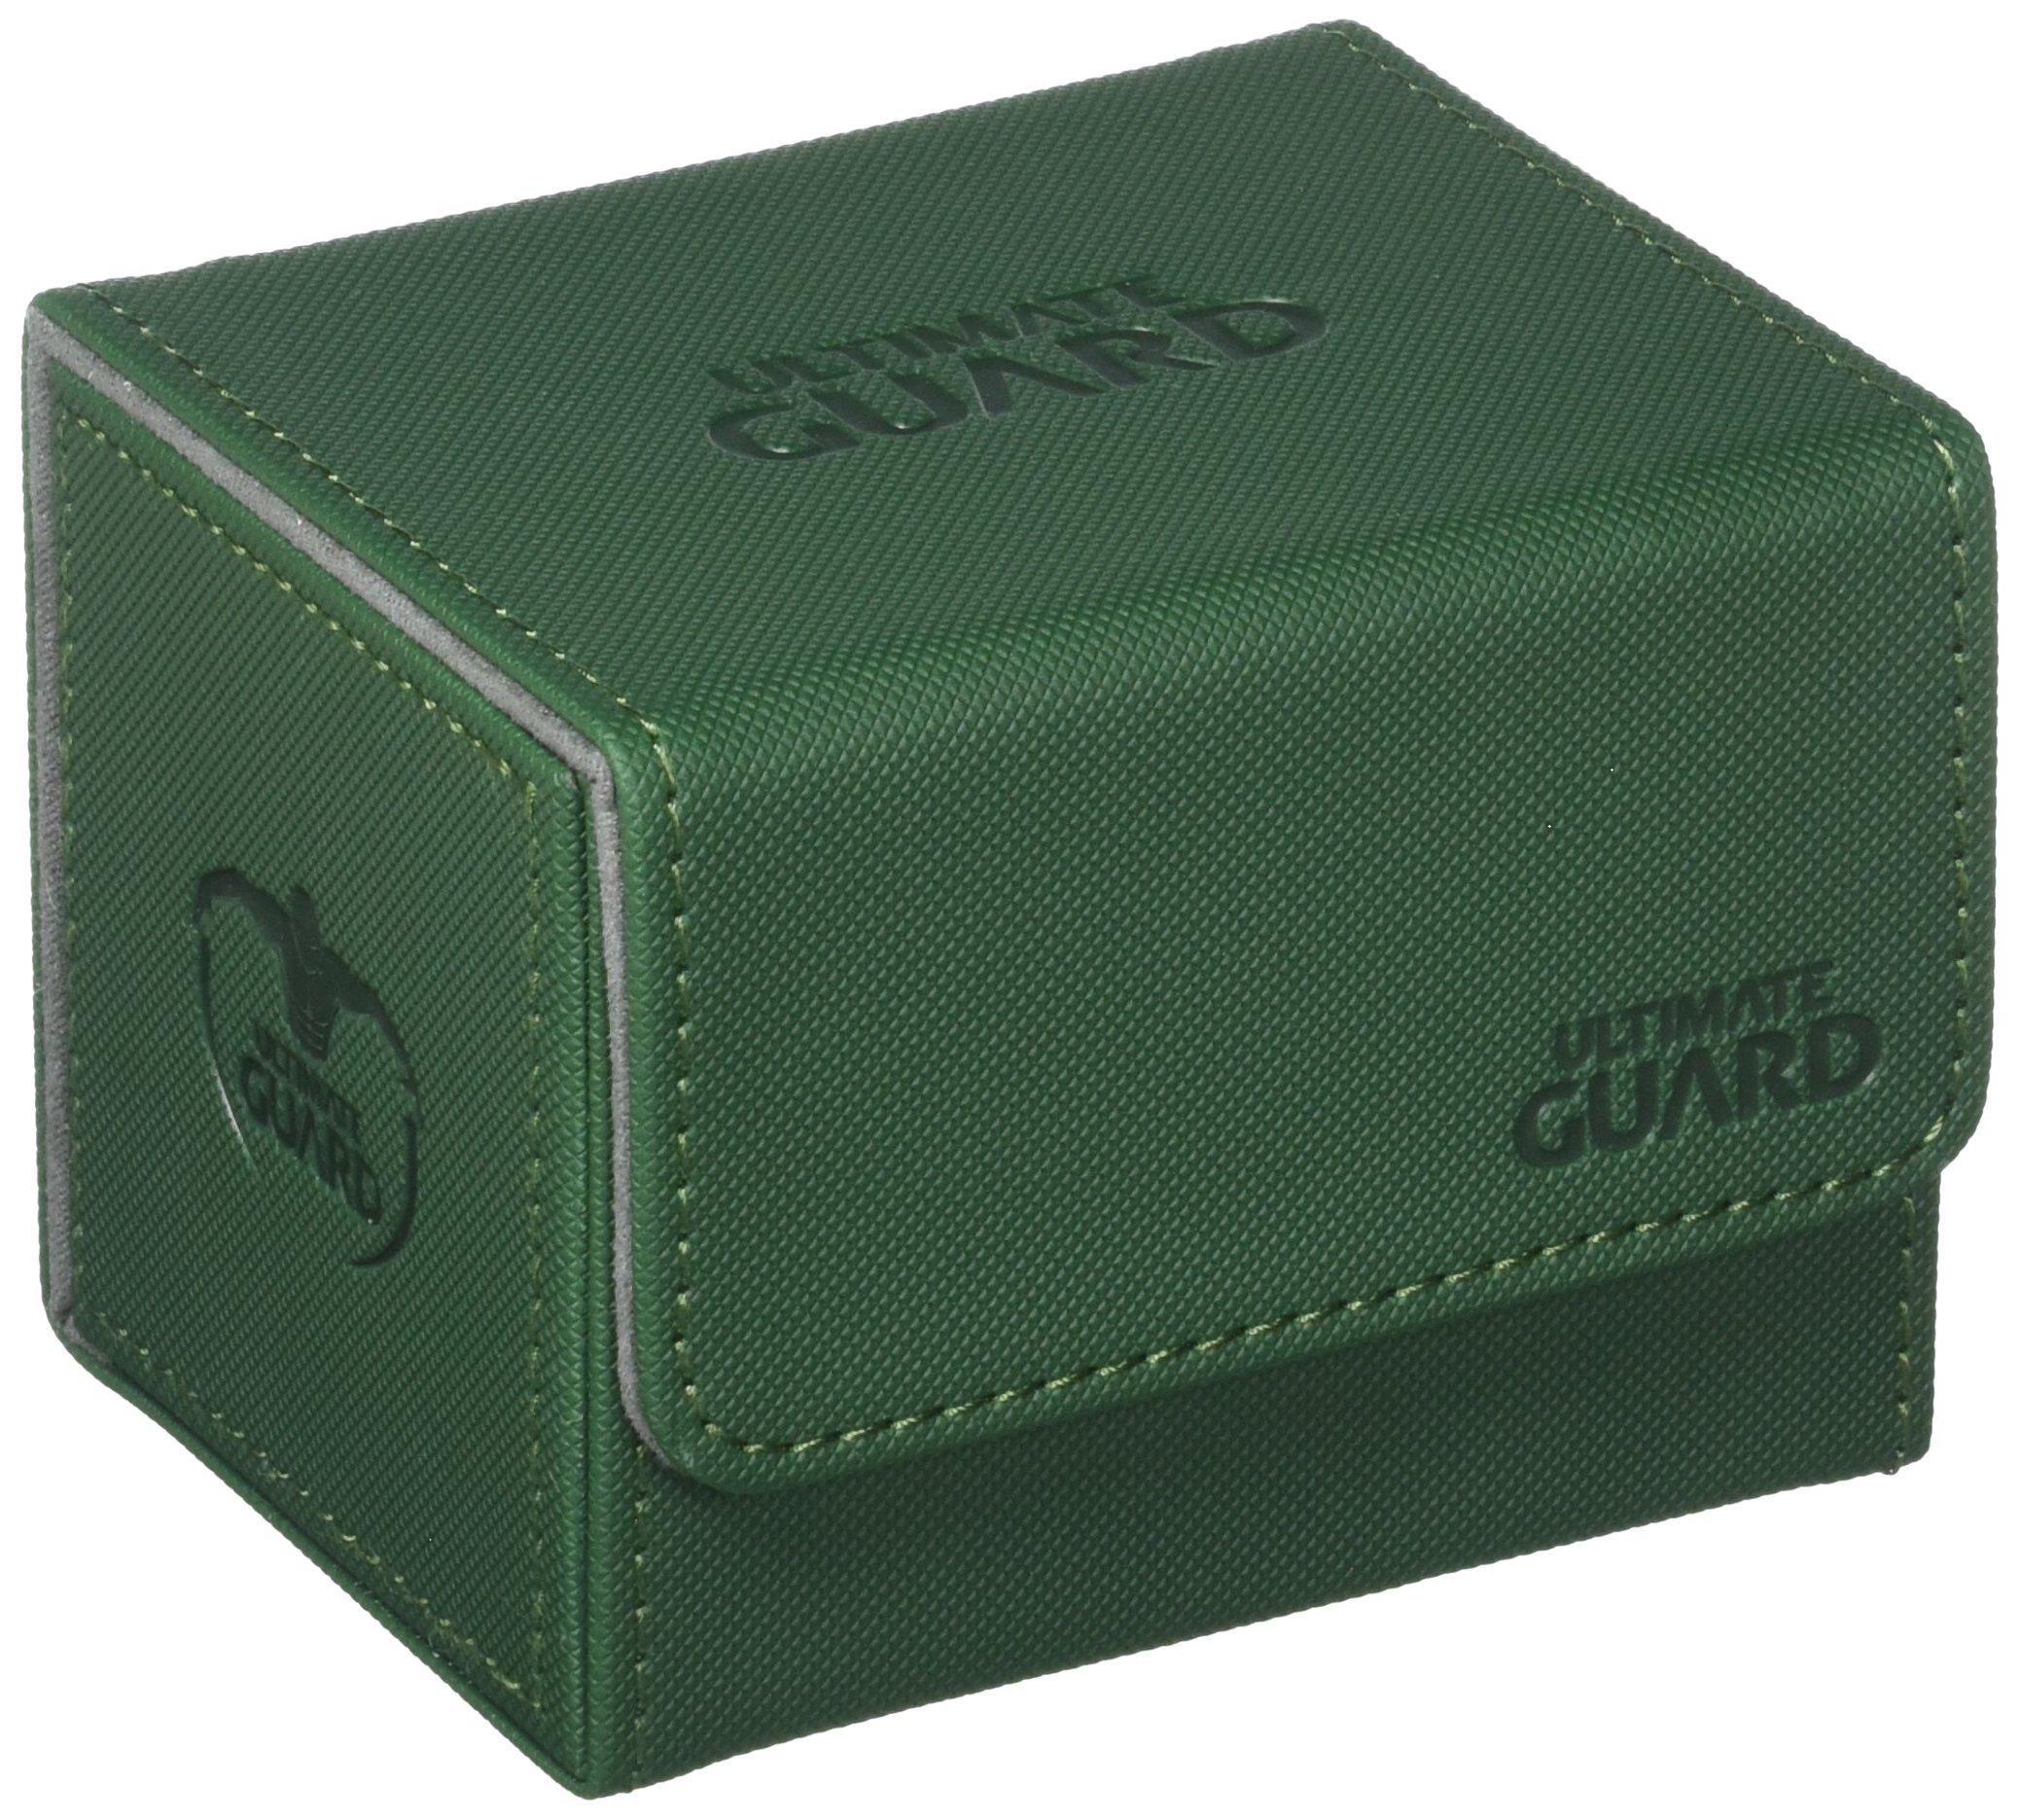 Ultimate Guard Sidewinder Deck Box 100+ XenoSkin Card Game, Green, Large